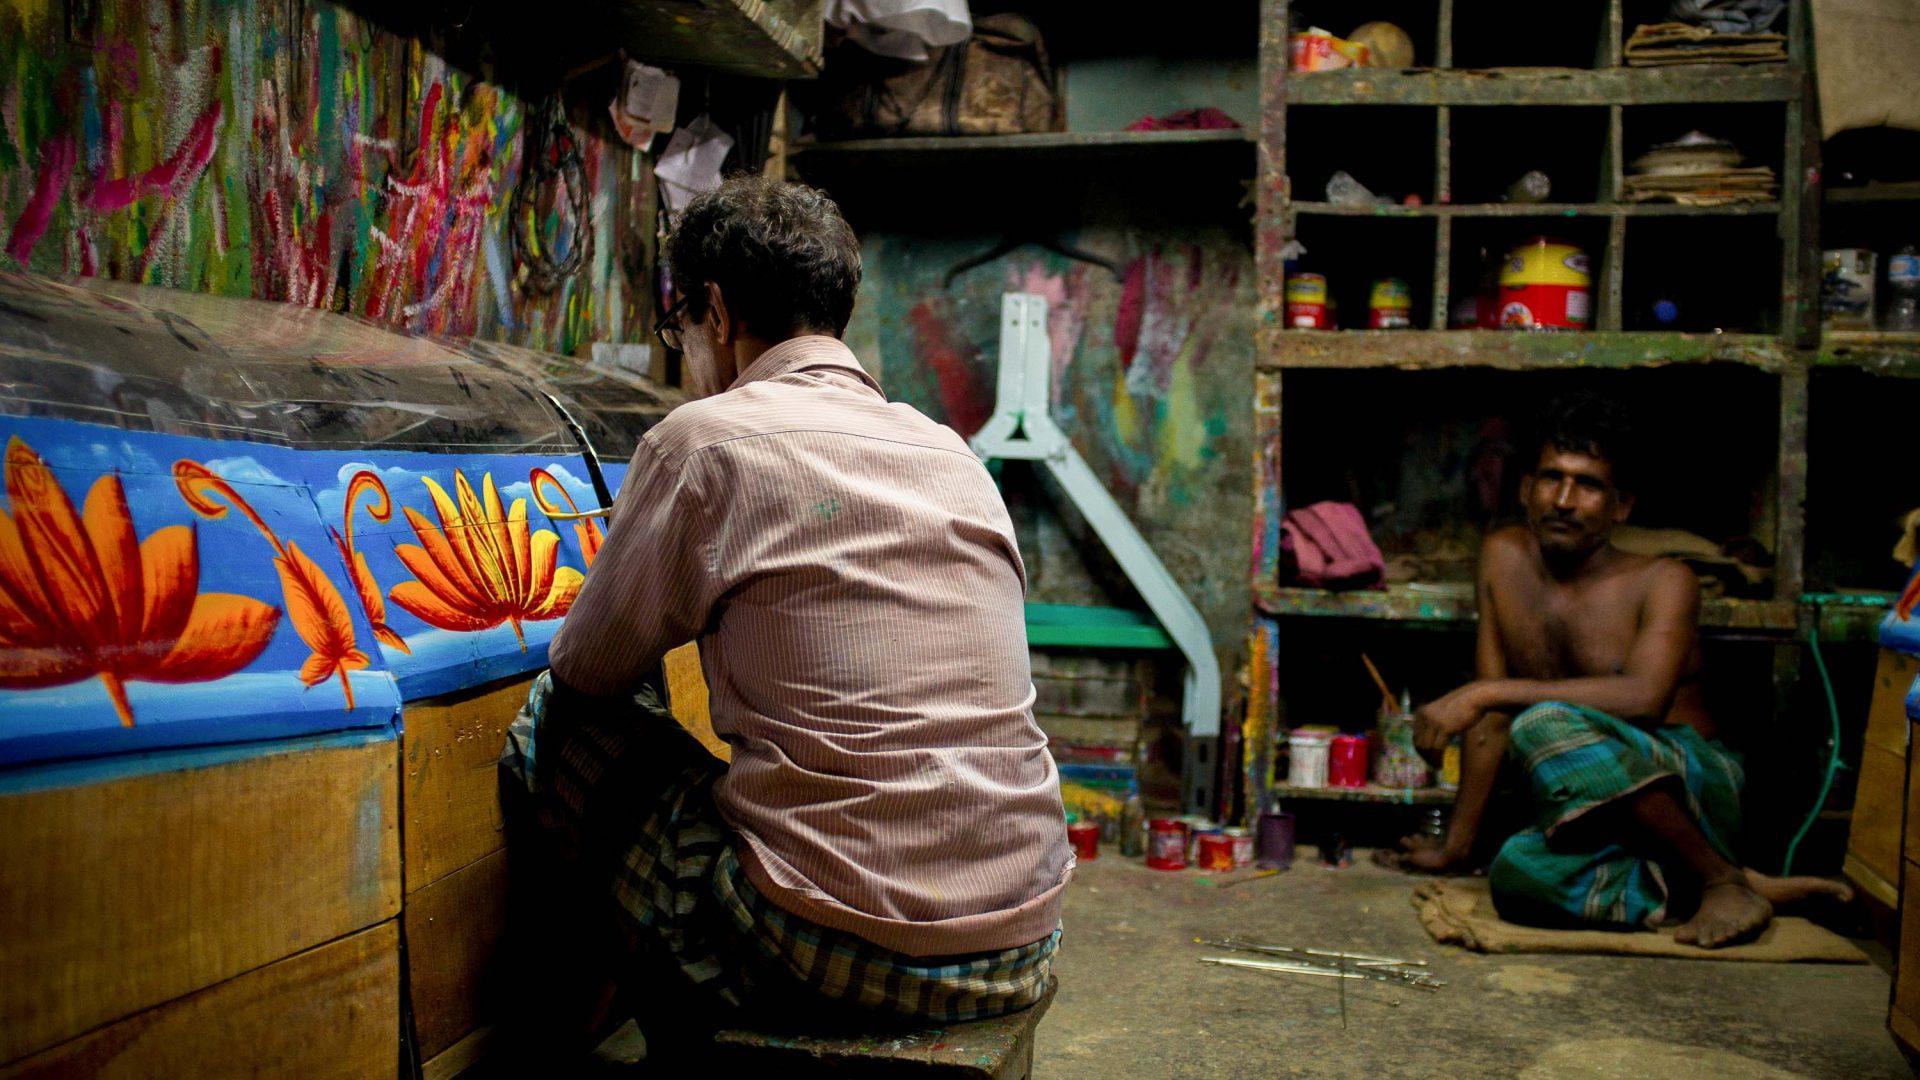 Bonjo painting a lily at his workshop in Chittagong, Bangladesh.